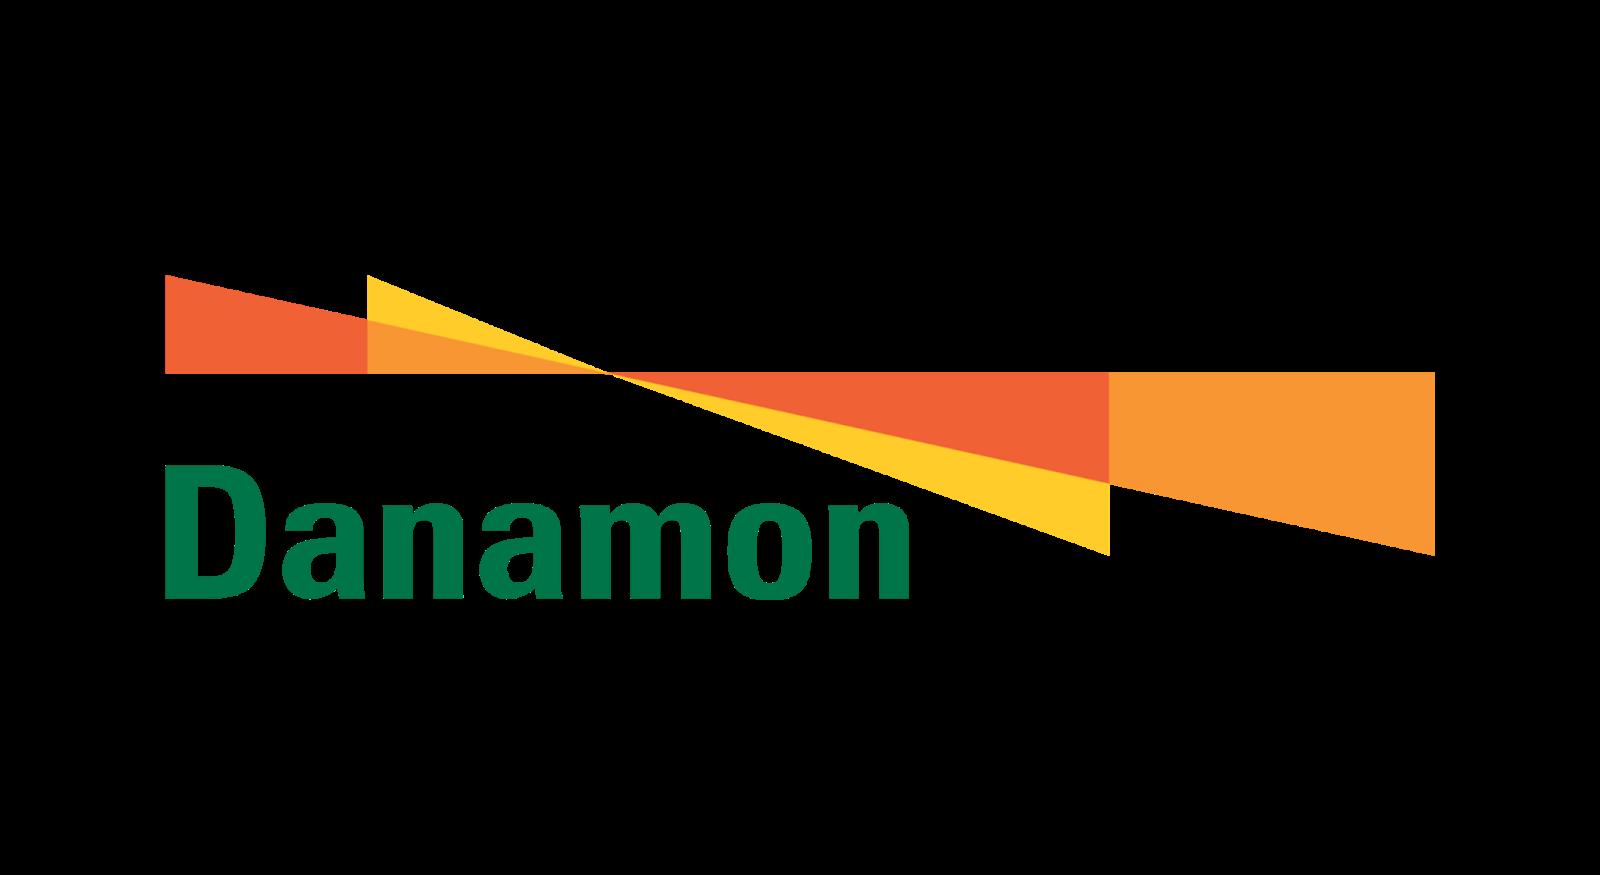 Logo Bank Danamon Format PNG